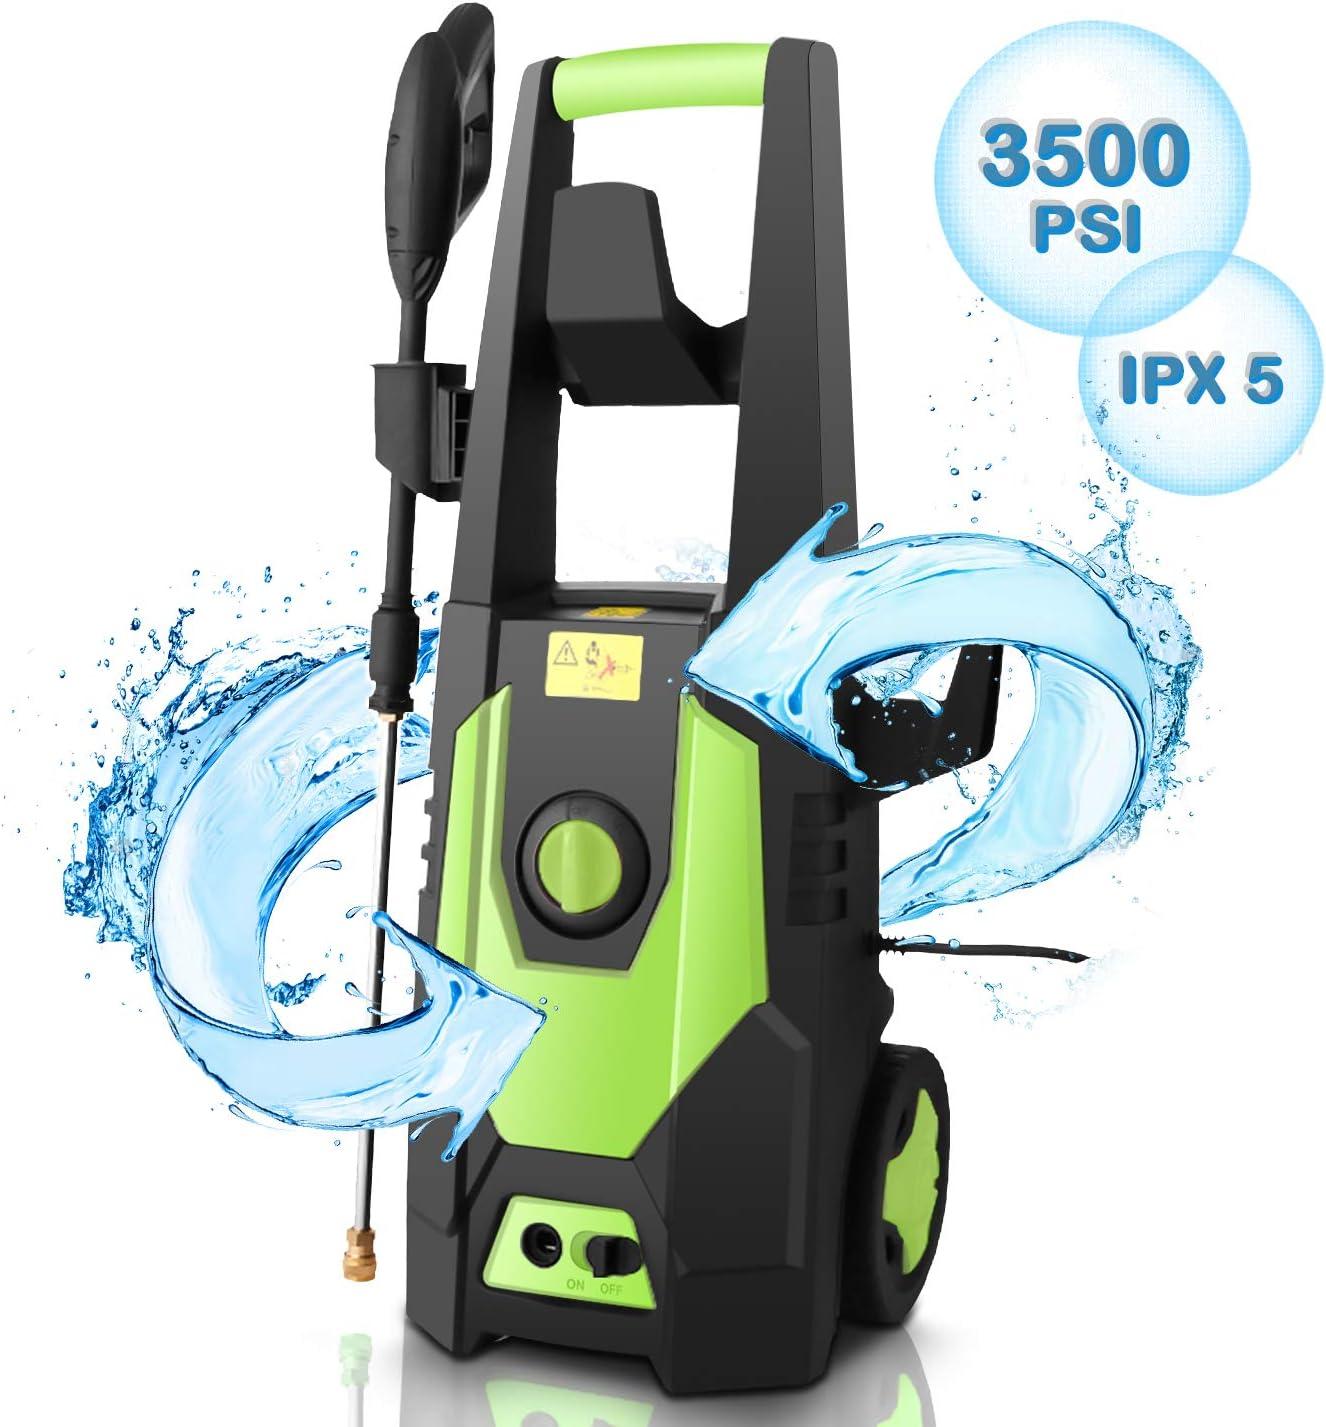 CHAKOR 3500PSI Pressure Washer Electric, 2.0GPM High Power Washer Cleaner Machine